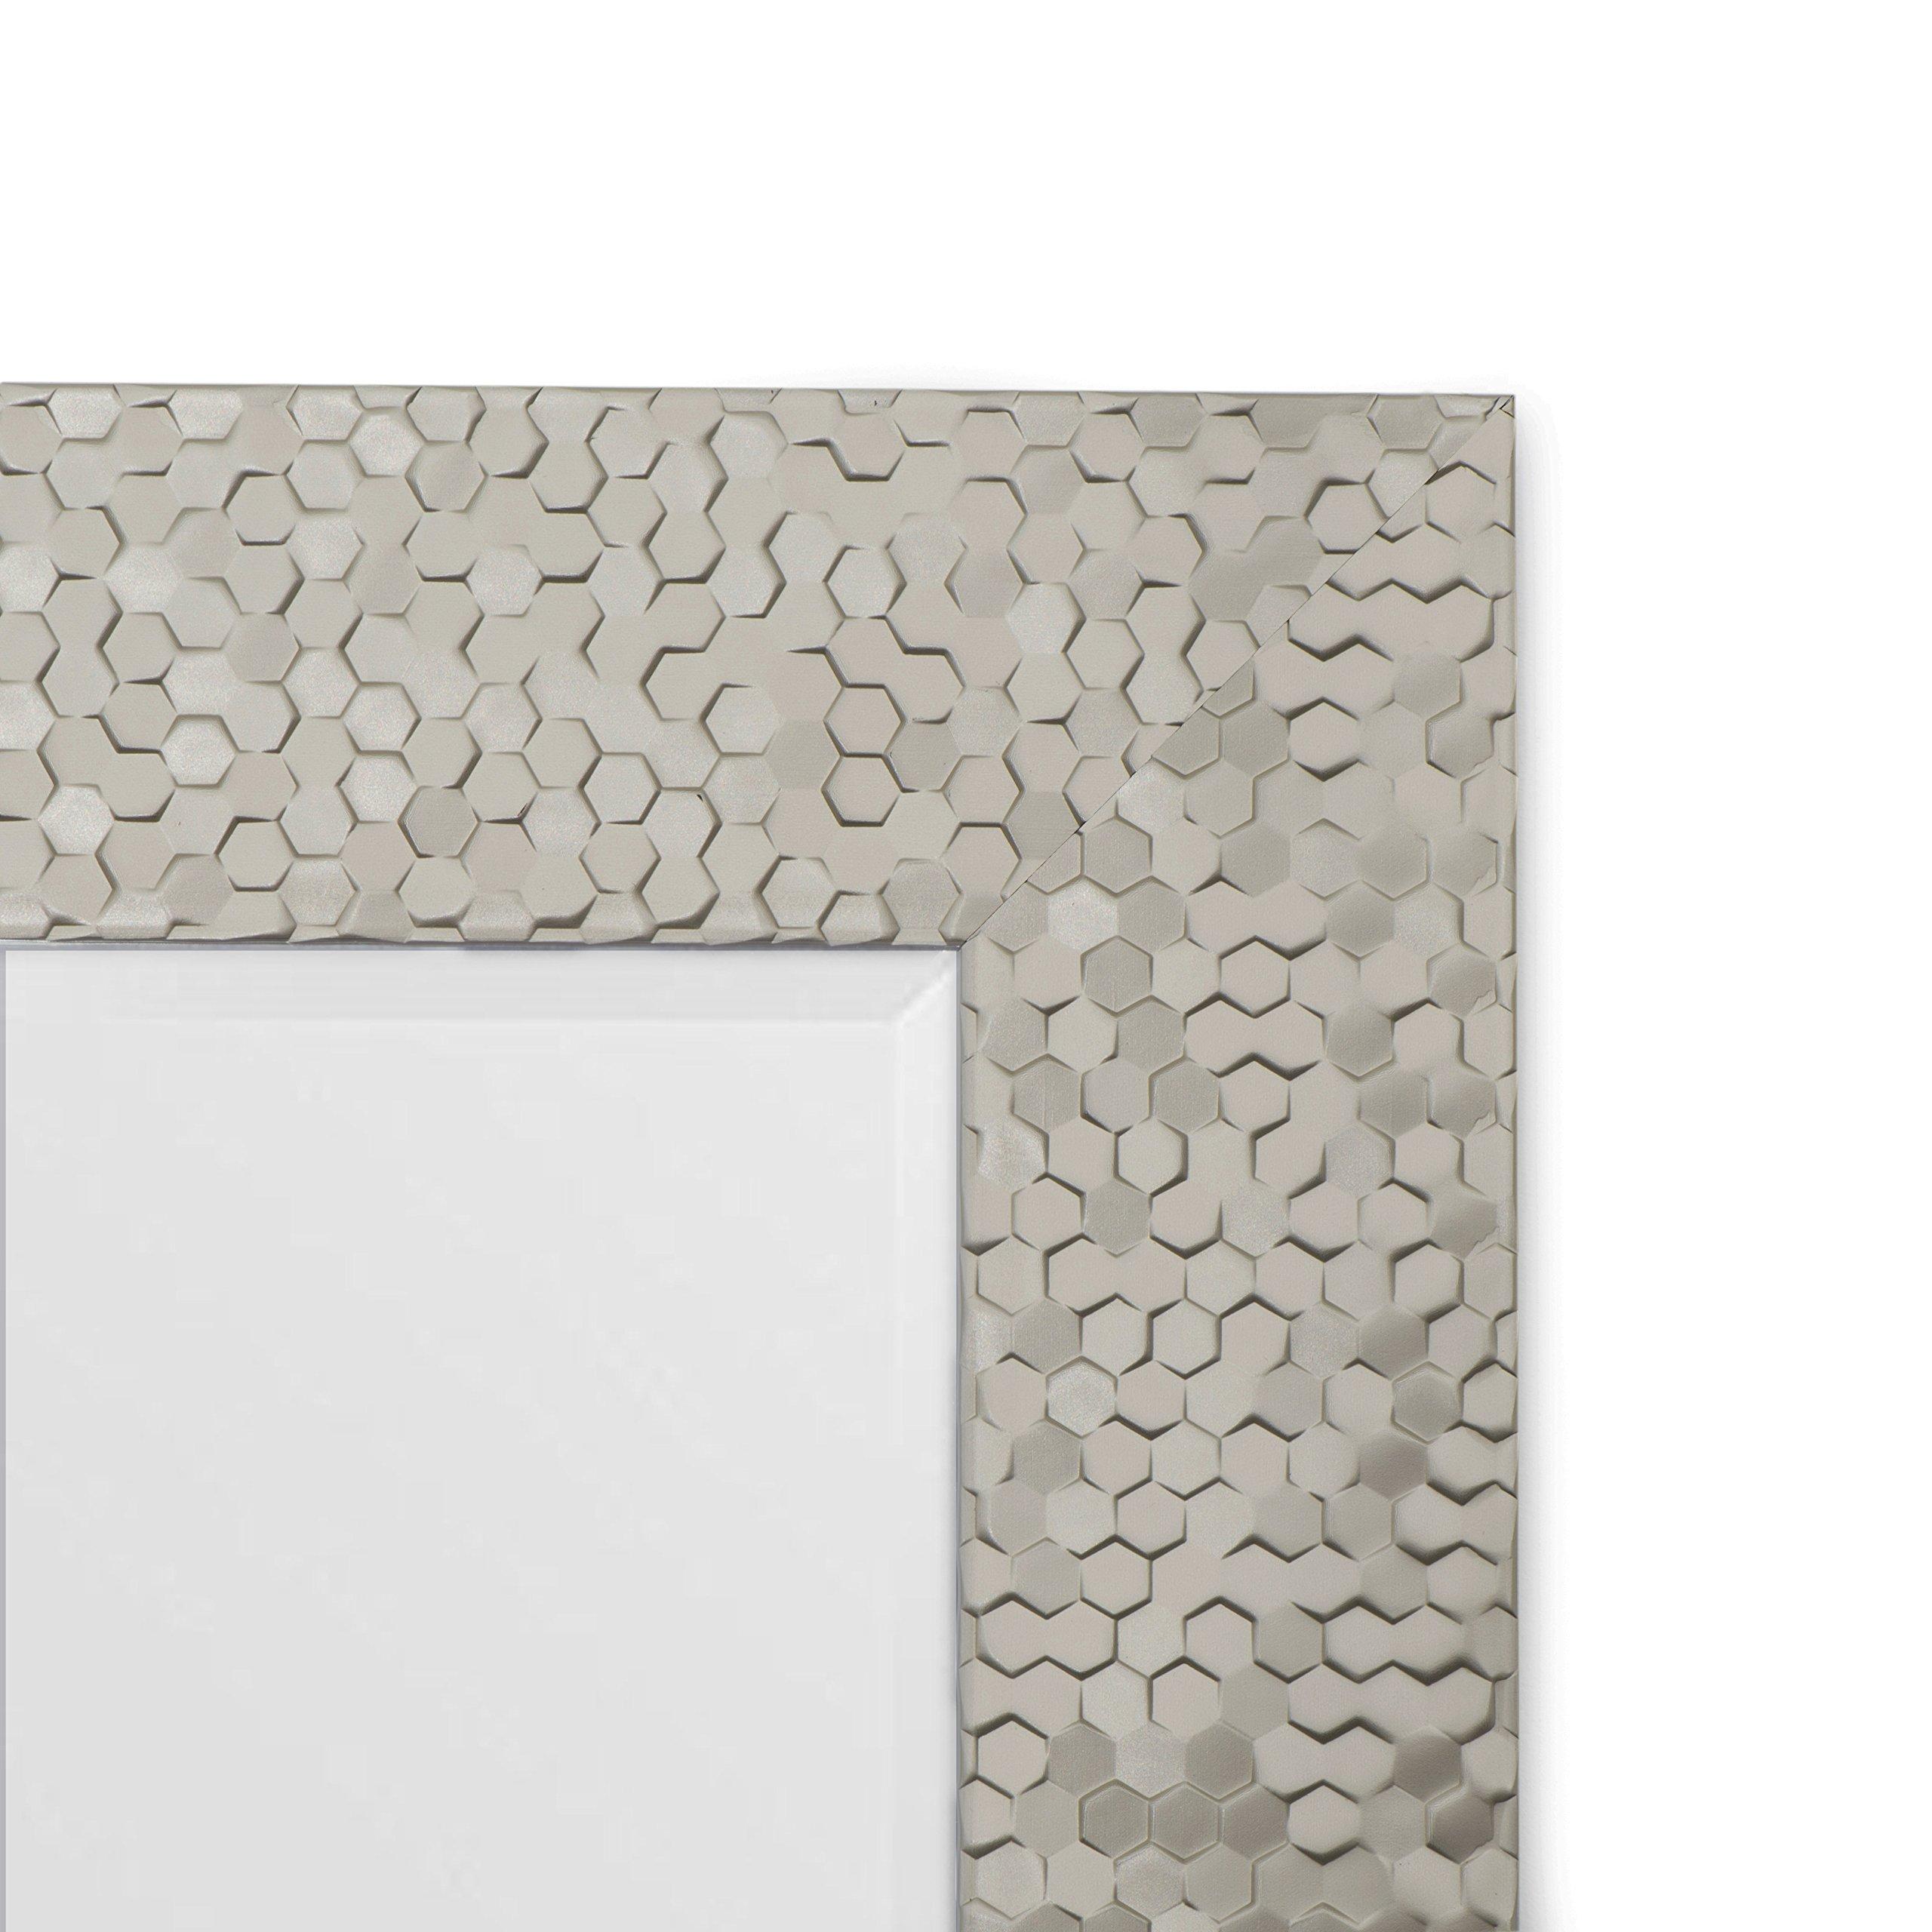 bb0020b7cd3e Wall Beveled Mirror Framed - Bedroom or Bathroom Rectangular Frame Hangs  Horizontal Vertical by EcoHome (21x25